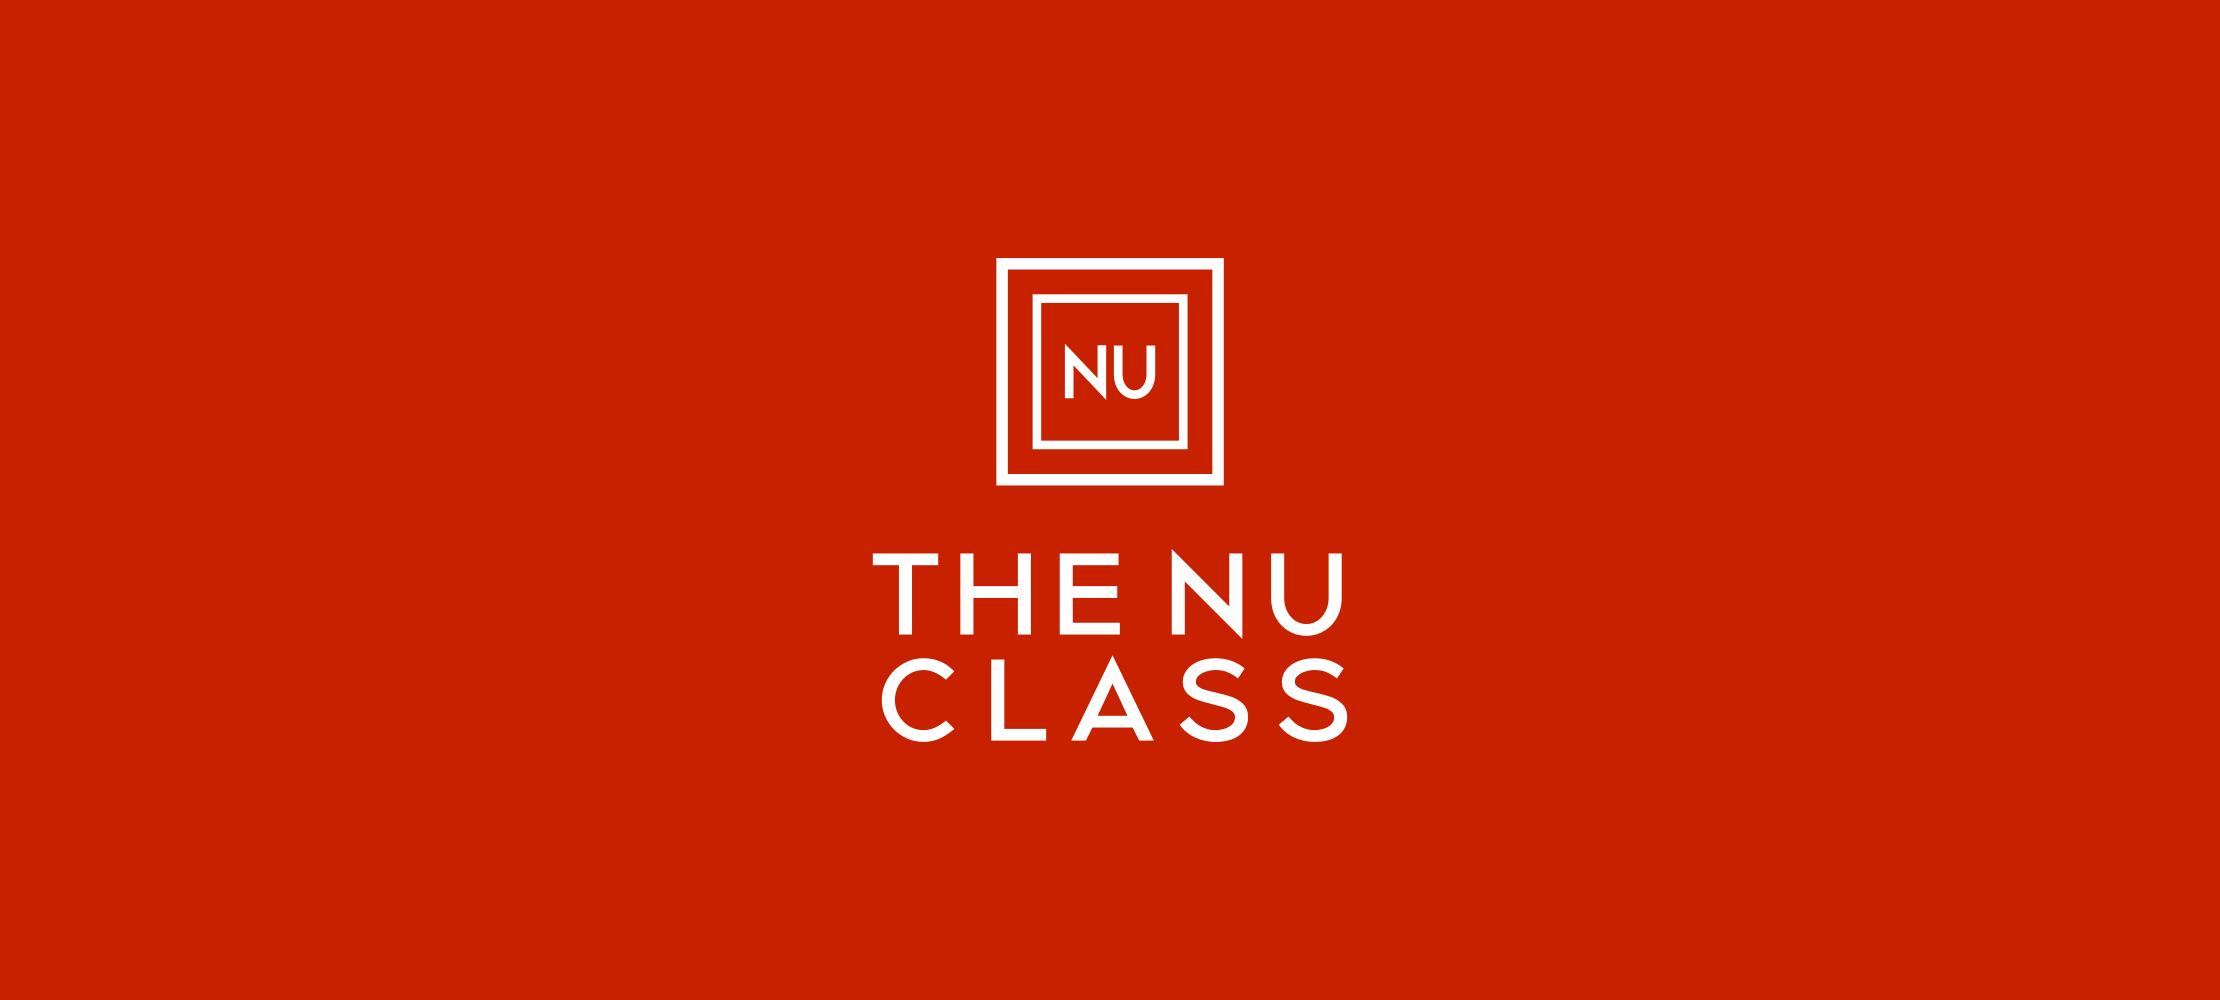 Thenuclass logo